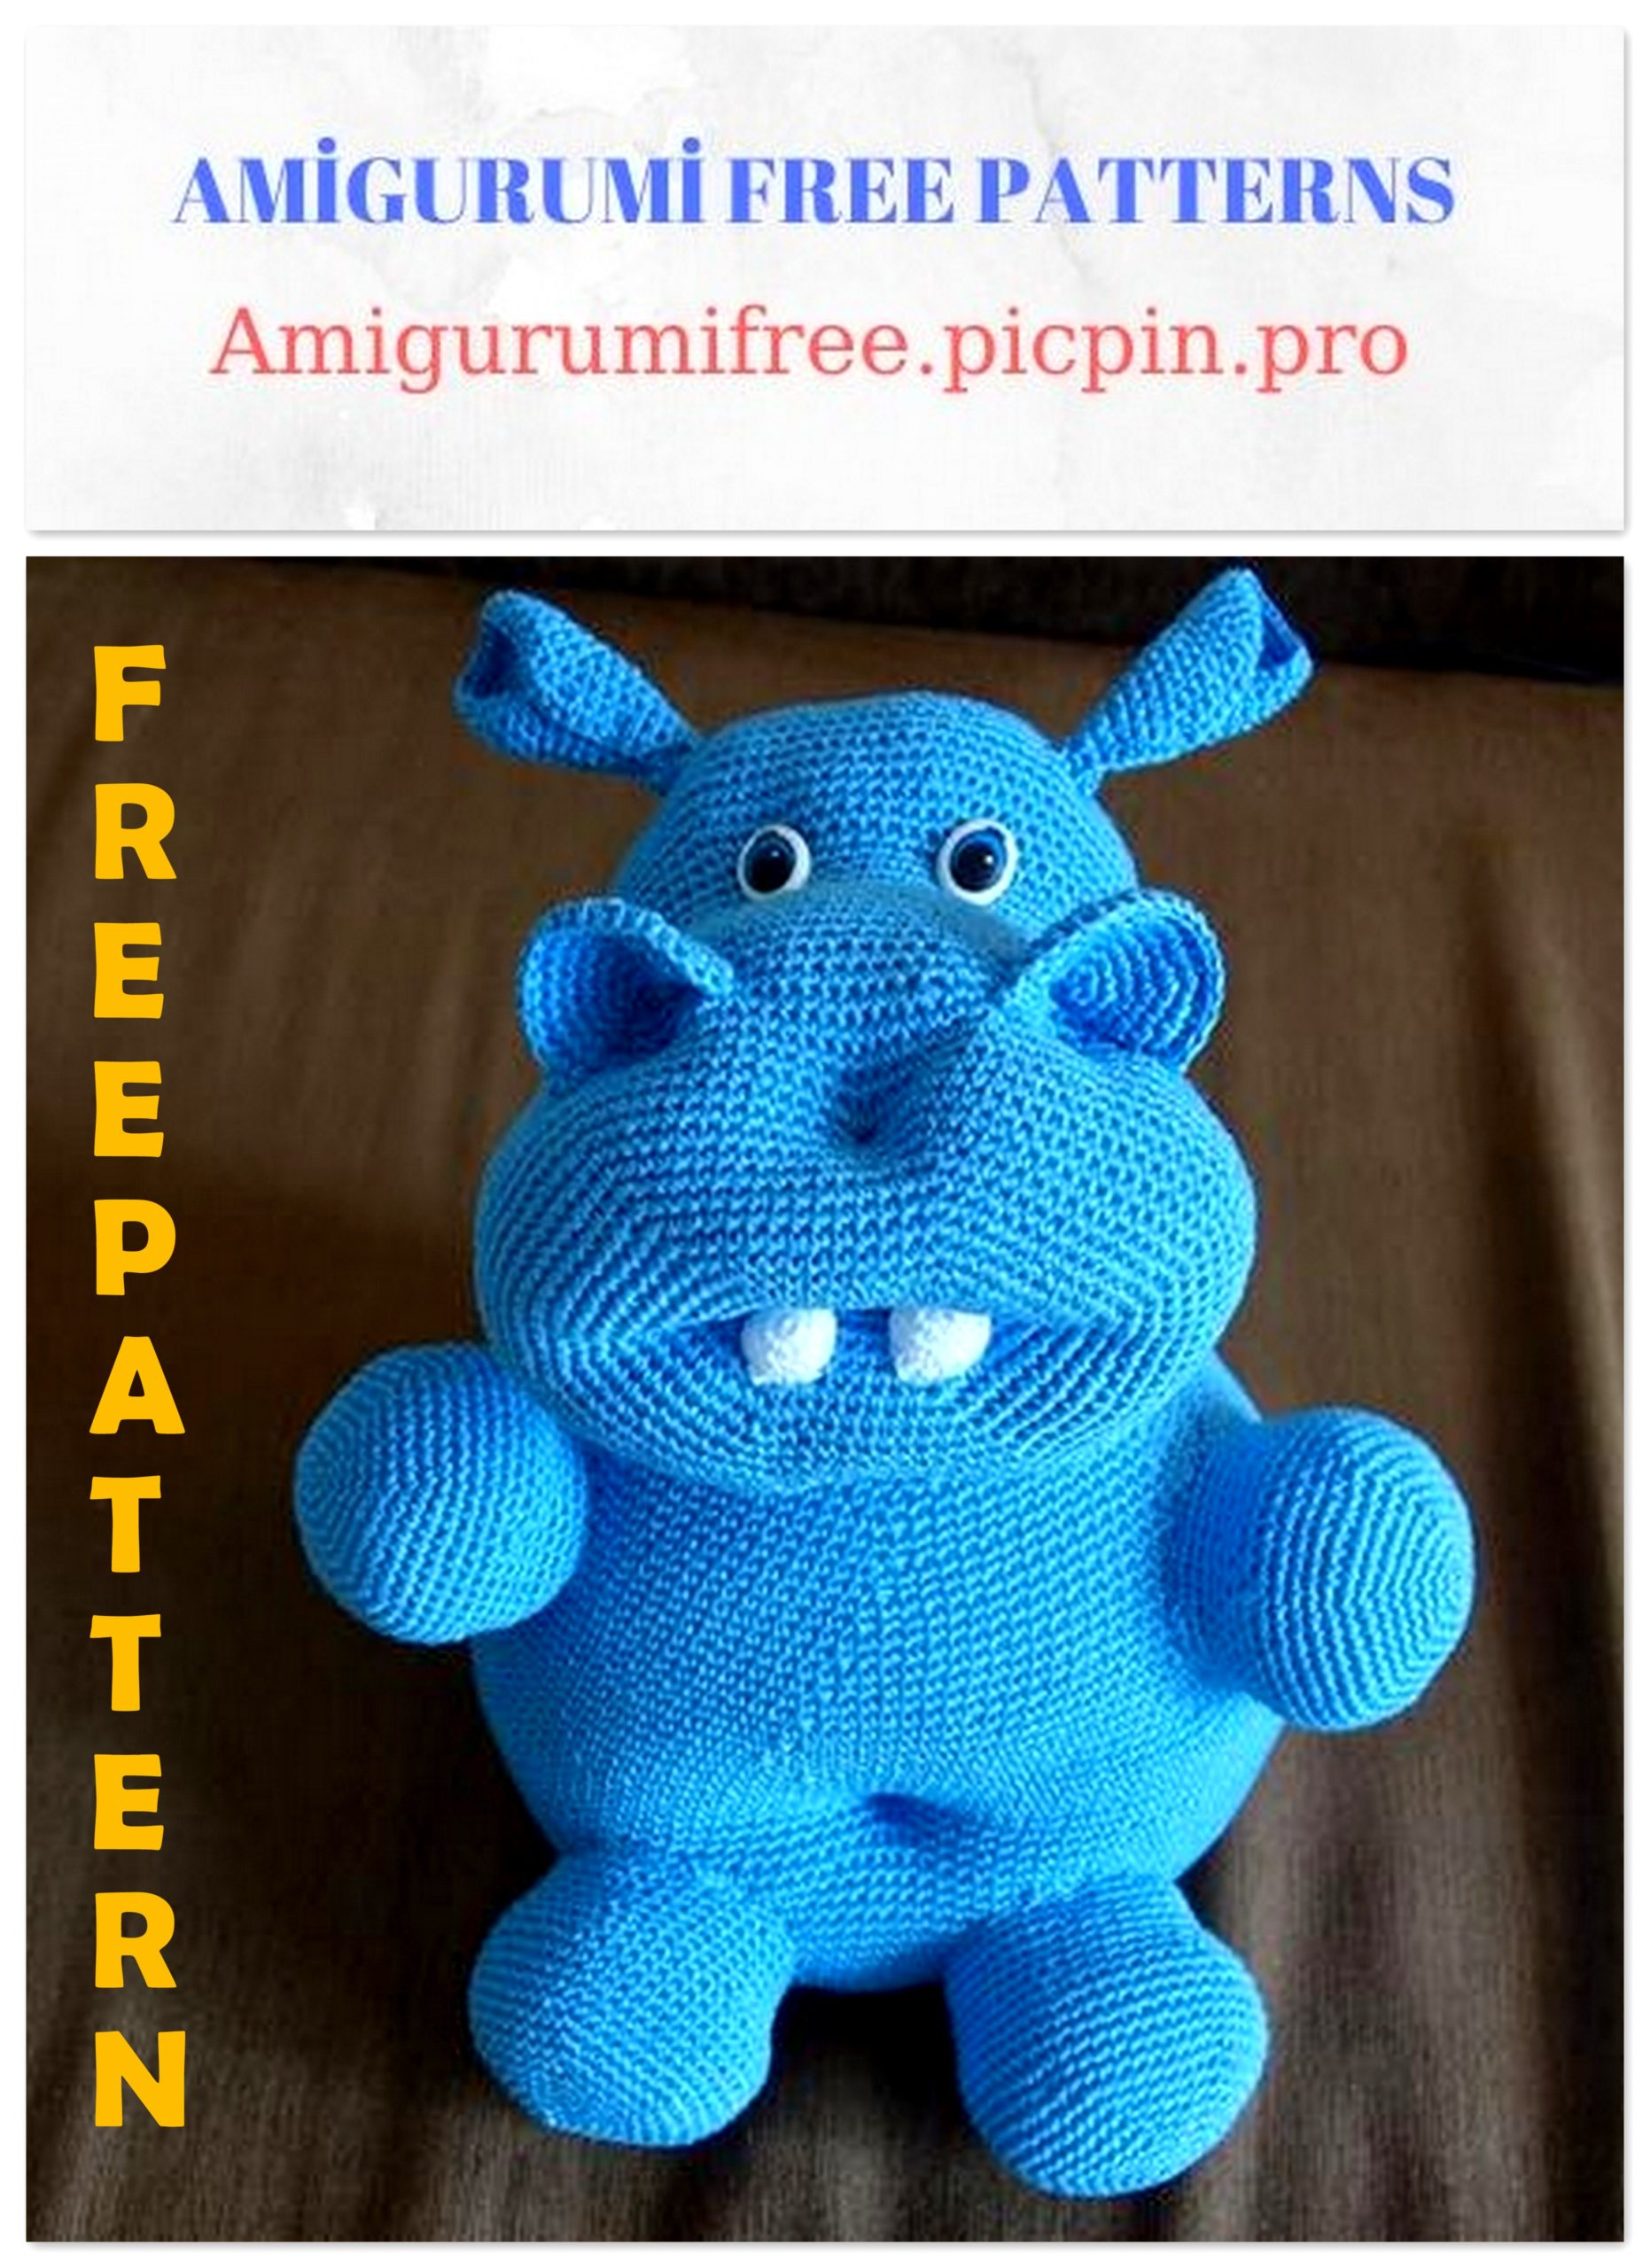 Amigurumi Today - Free amigurumi patterns and amigurumi tutorials   2560x1862